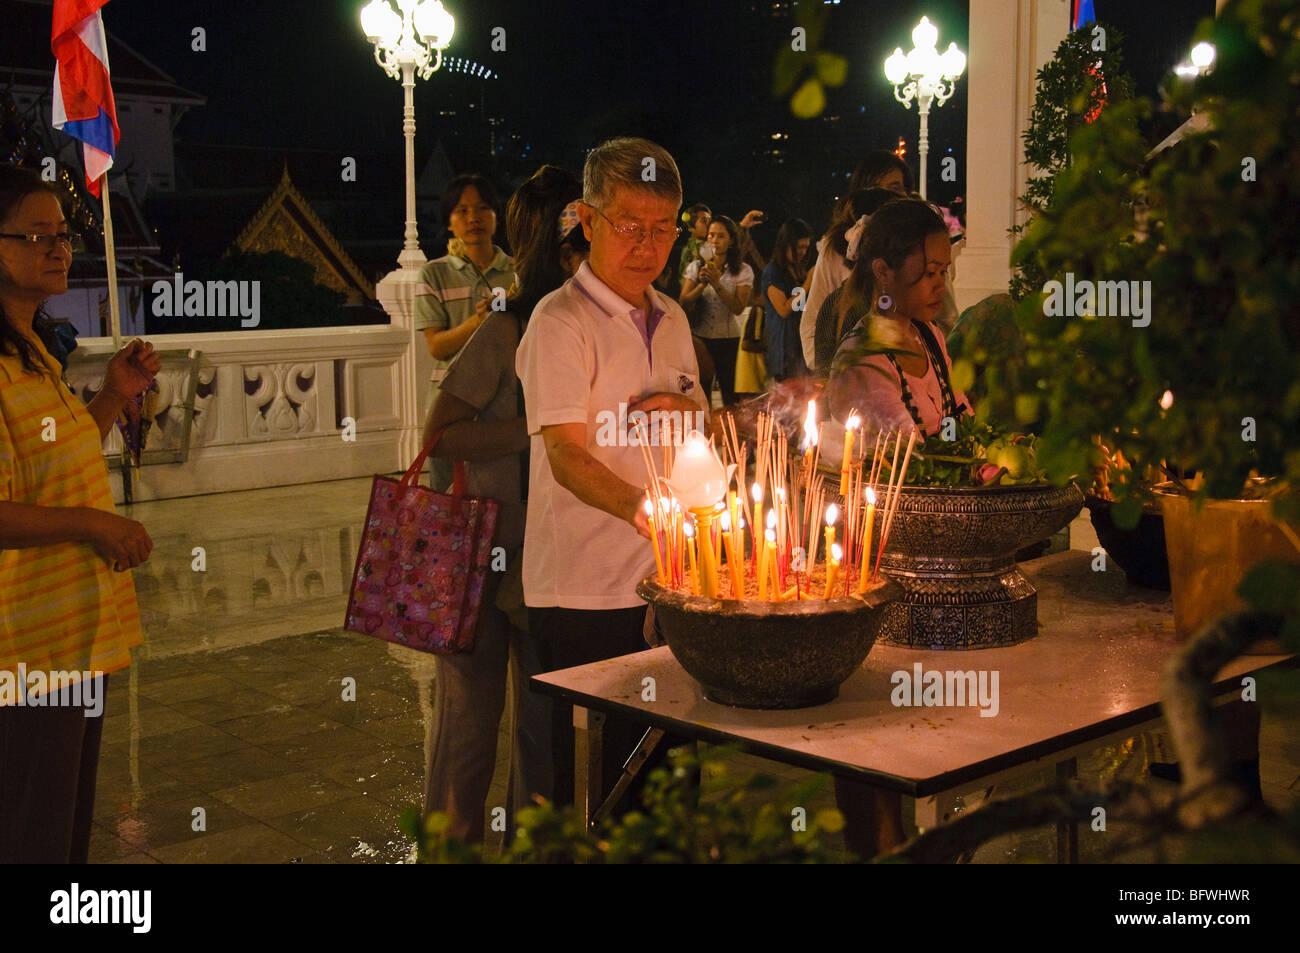 Maison de vacances Asalha Puja, Bouddha Day, temple Wat Yan Nawa, Bangkok, Thaïlande. Photo Stock